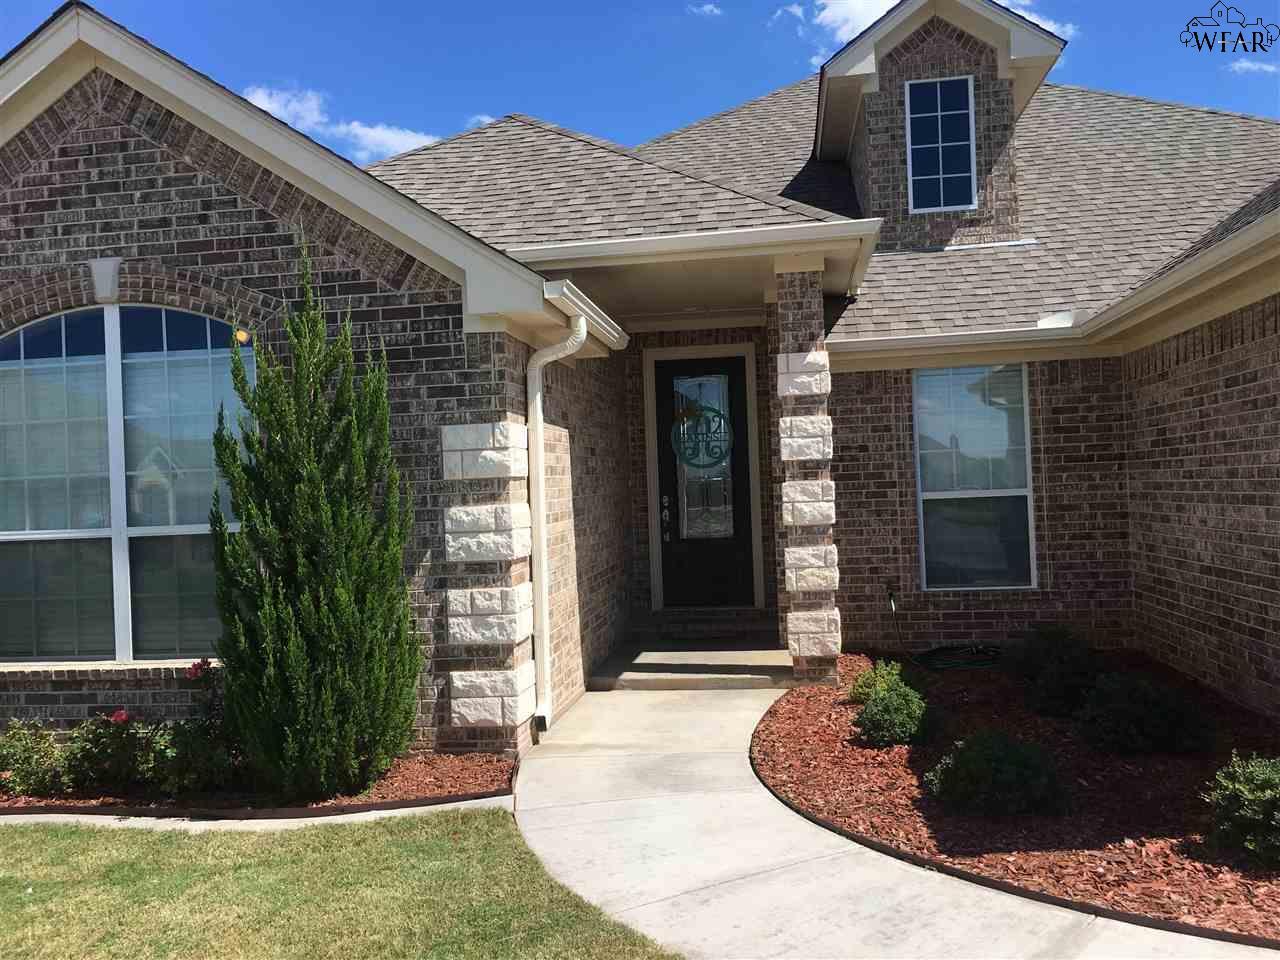 6 Peyton Court, Wichita Falls, TX 76310